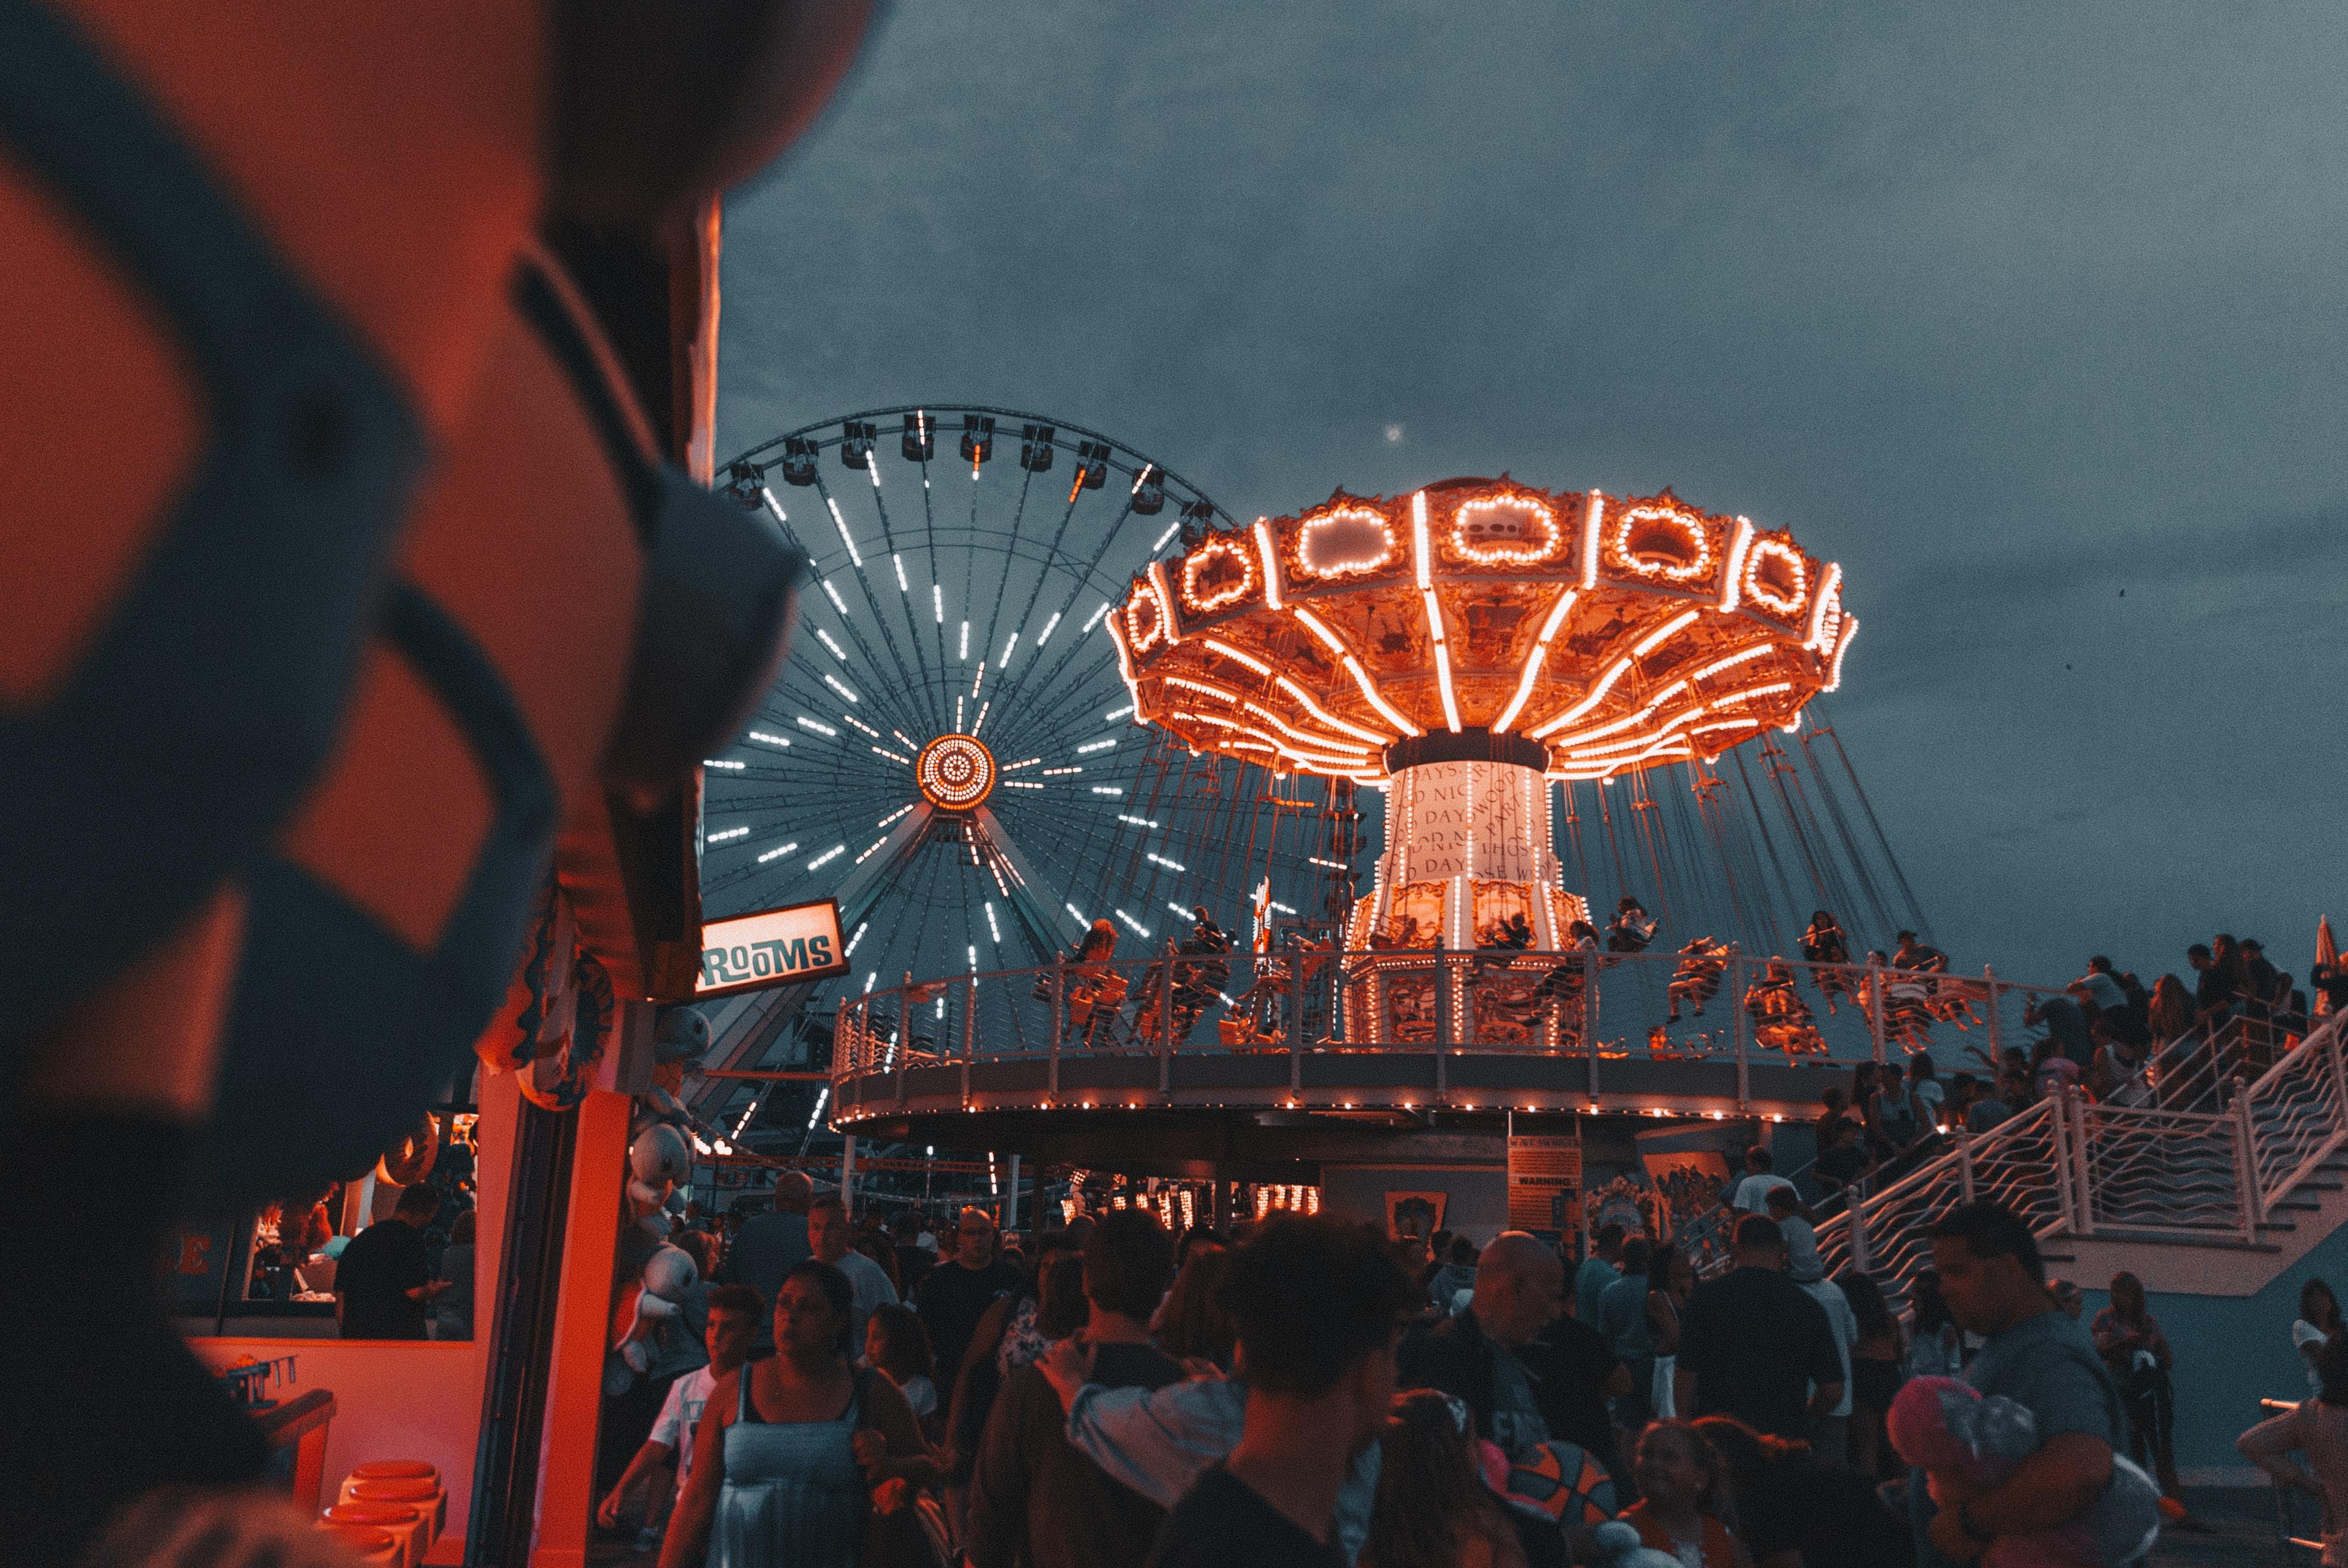 amusement park during nighttime